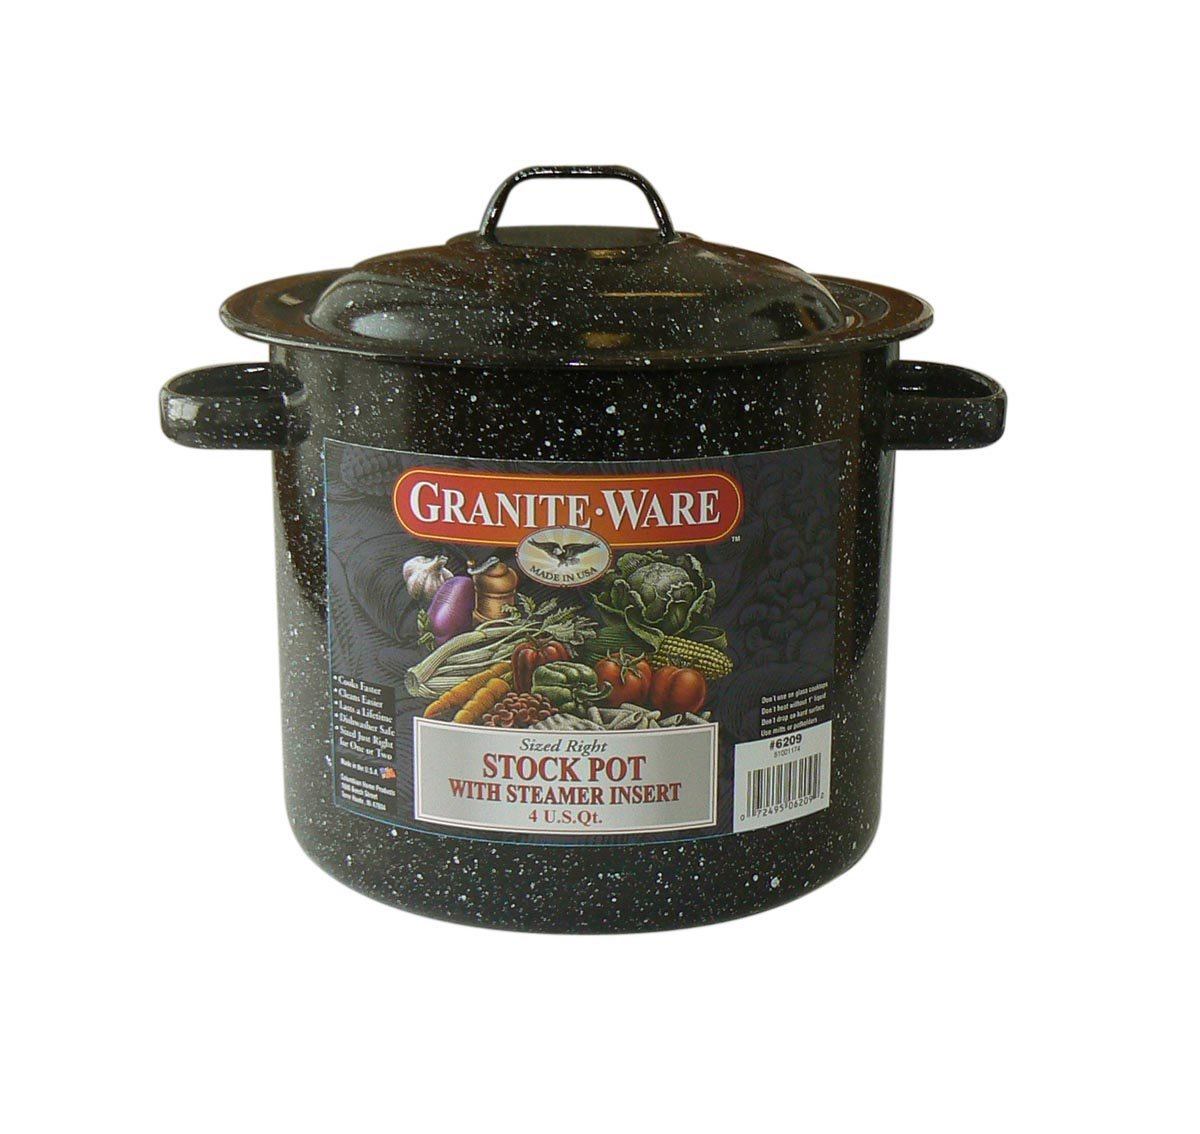 Granite Ware Stock Pot with Steamer Insert, 4-Quart